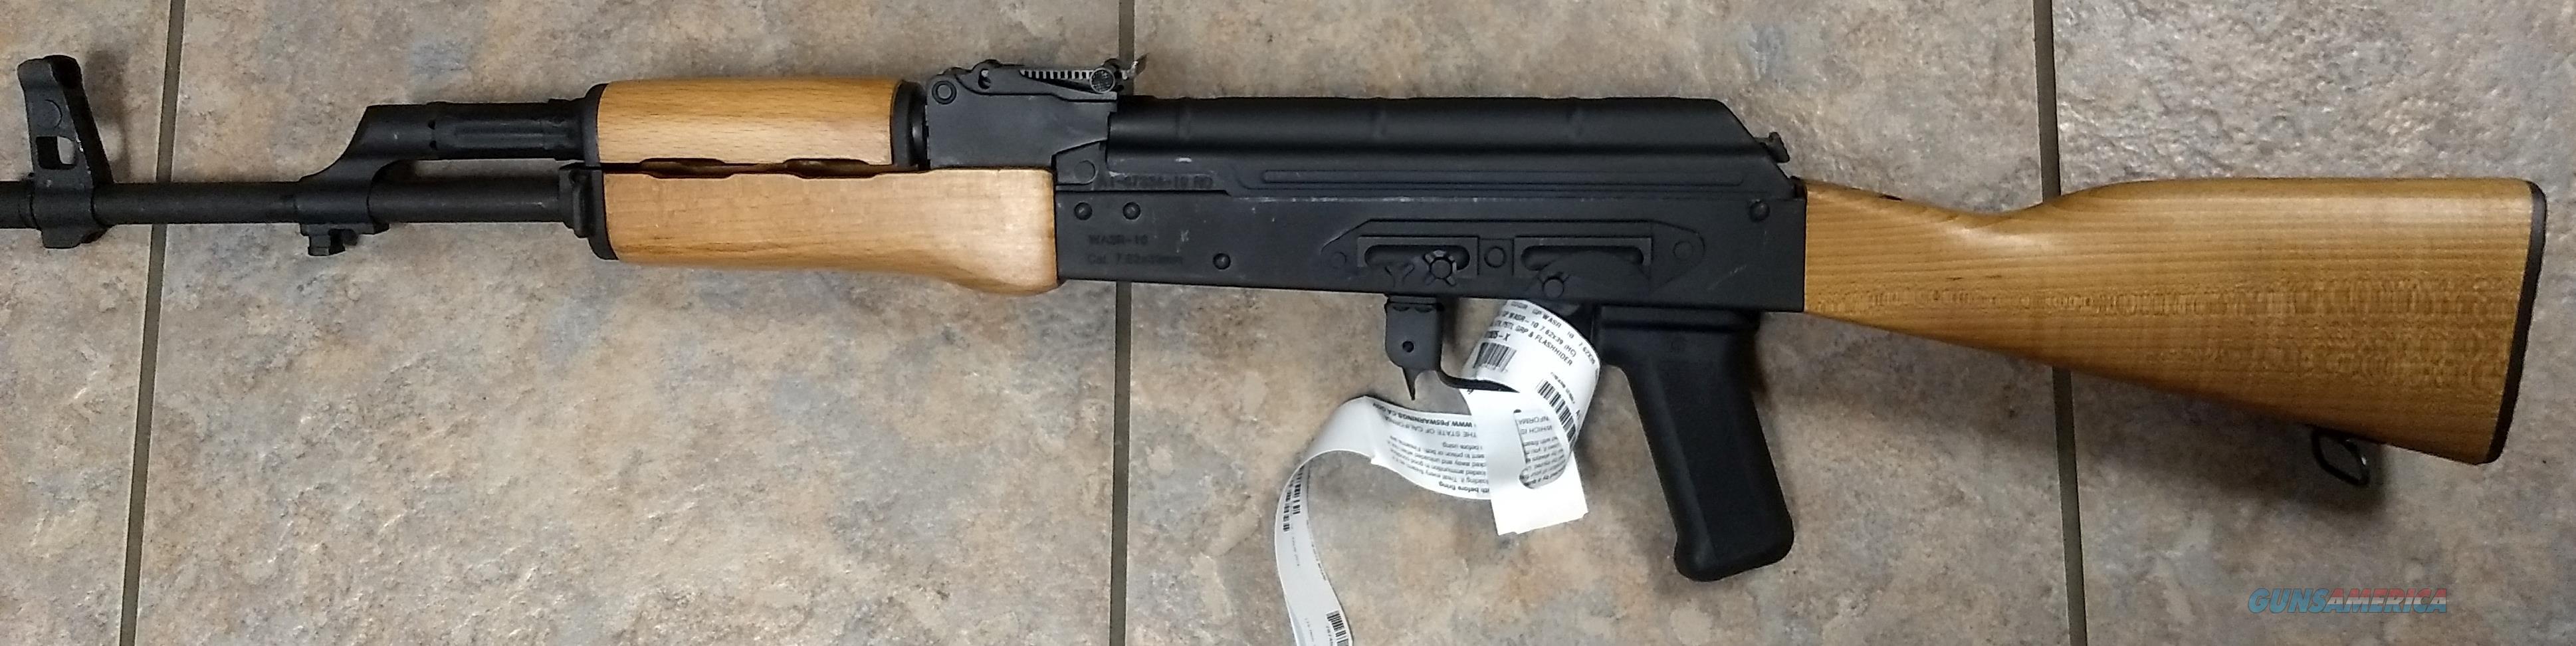 WASR 10 7.62x39mm AK47 Romania   Guns > Rifles > Century International Arms - Rifles > Rifles